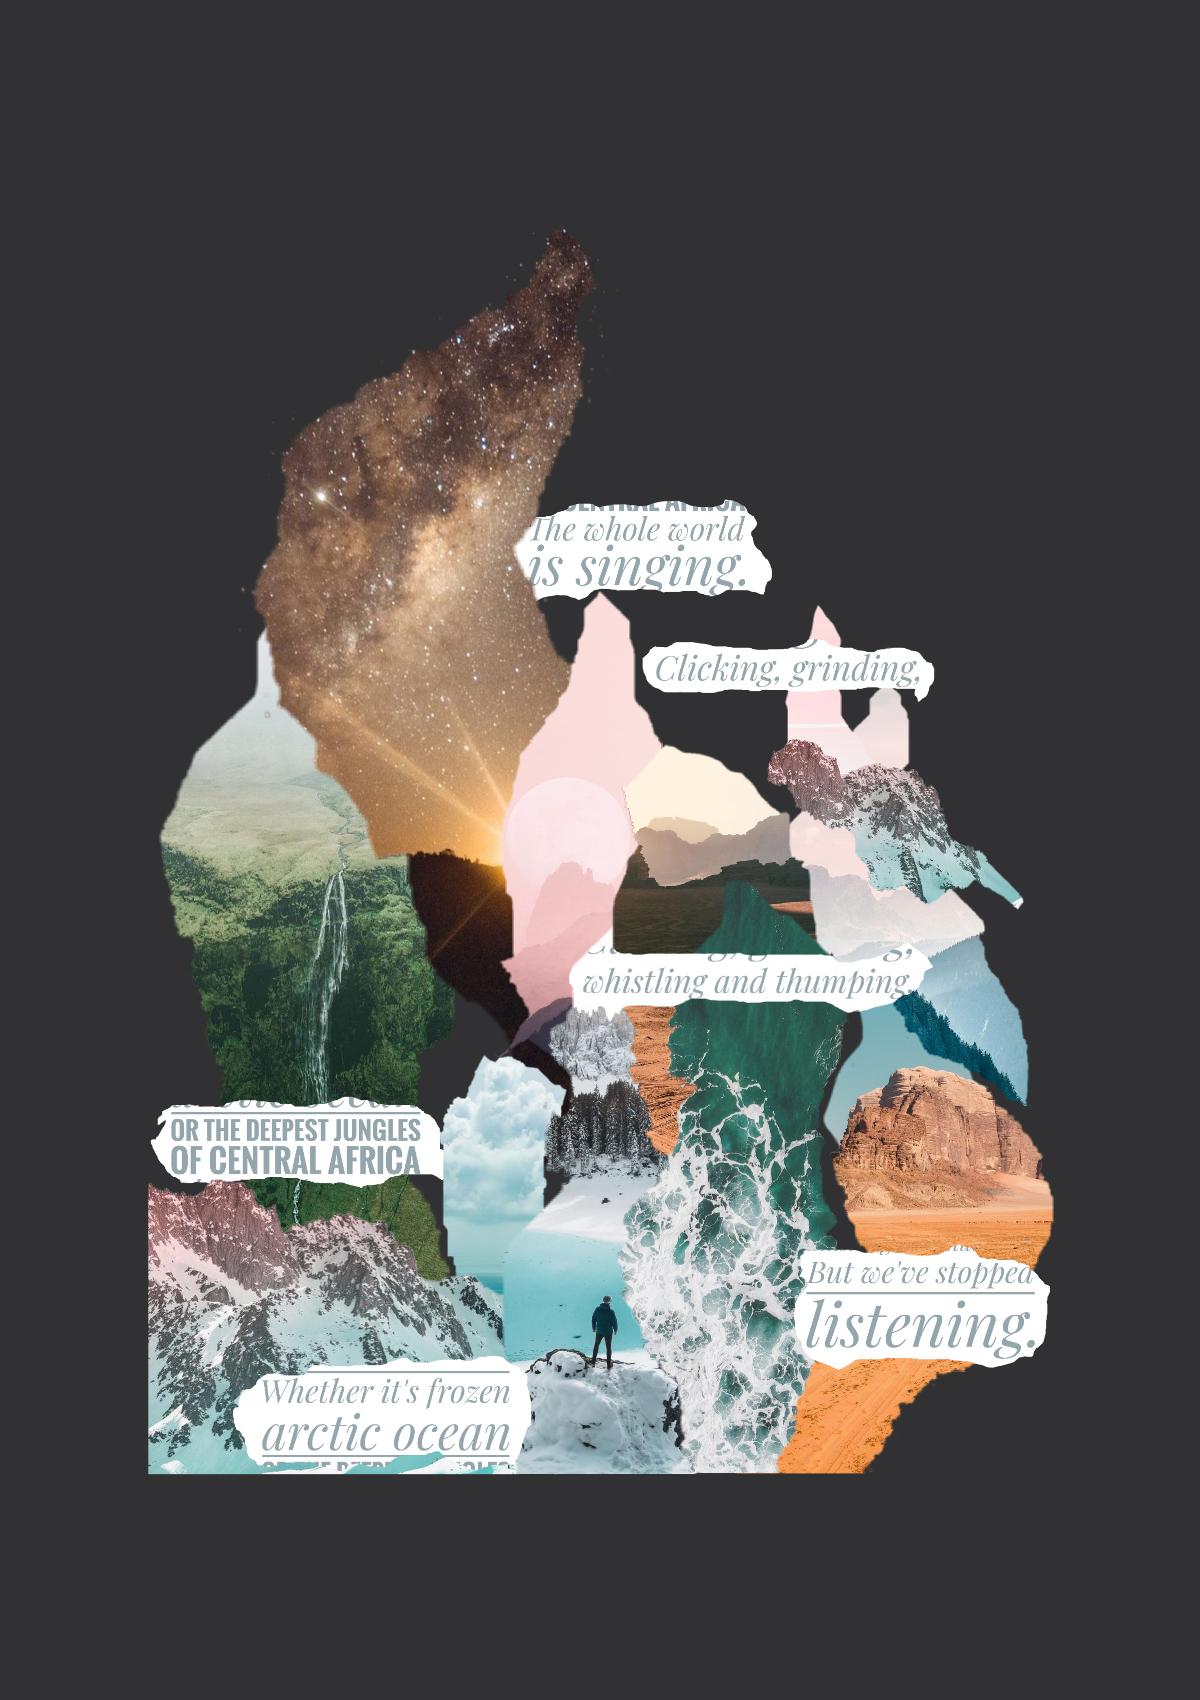 Keneilwe Mokoena, #2511, 2019  Digital Collage  148 x 210 mm  Ed: 10  R 2100 (Unframed)